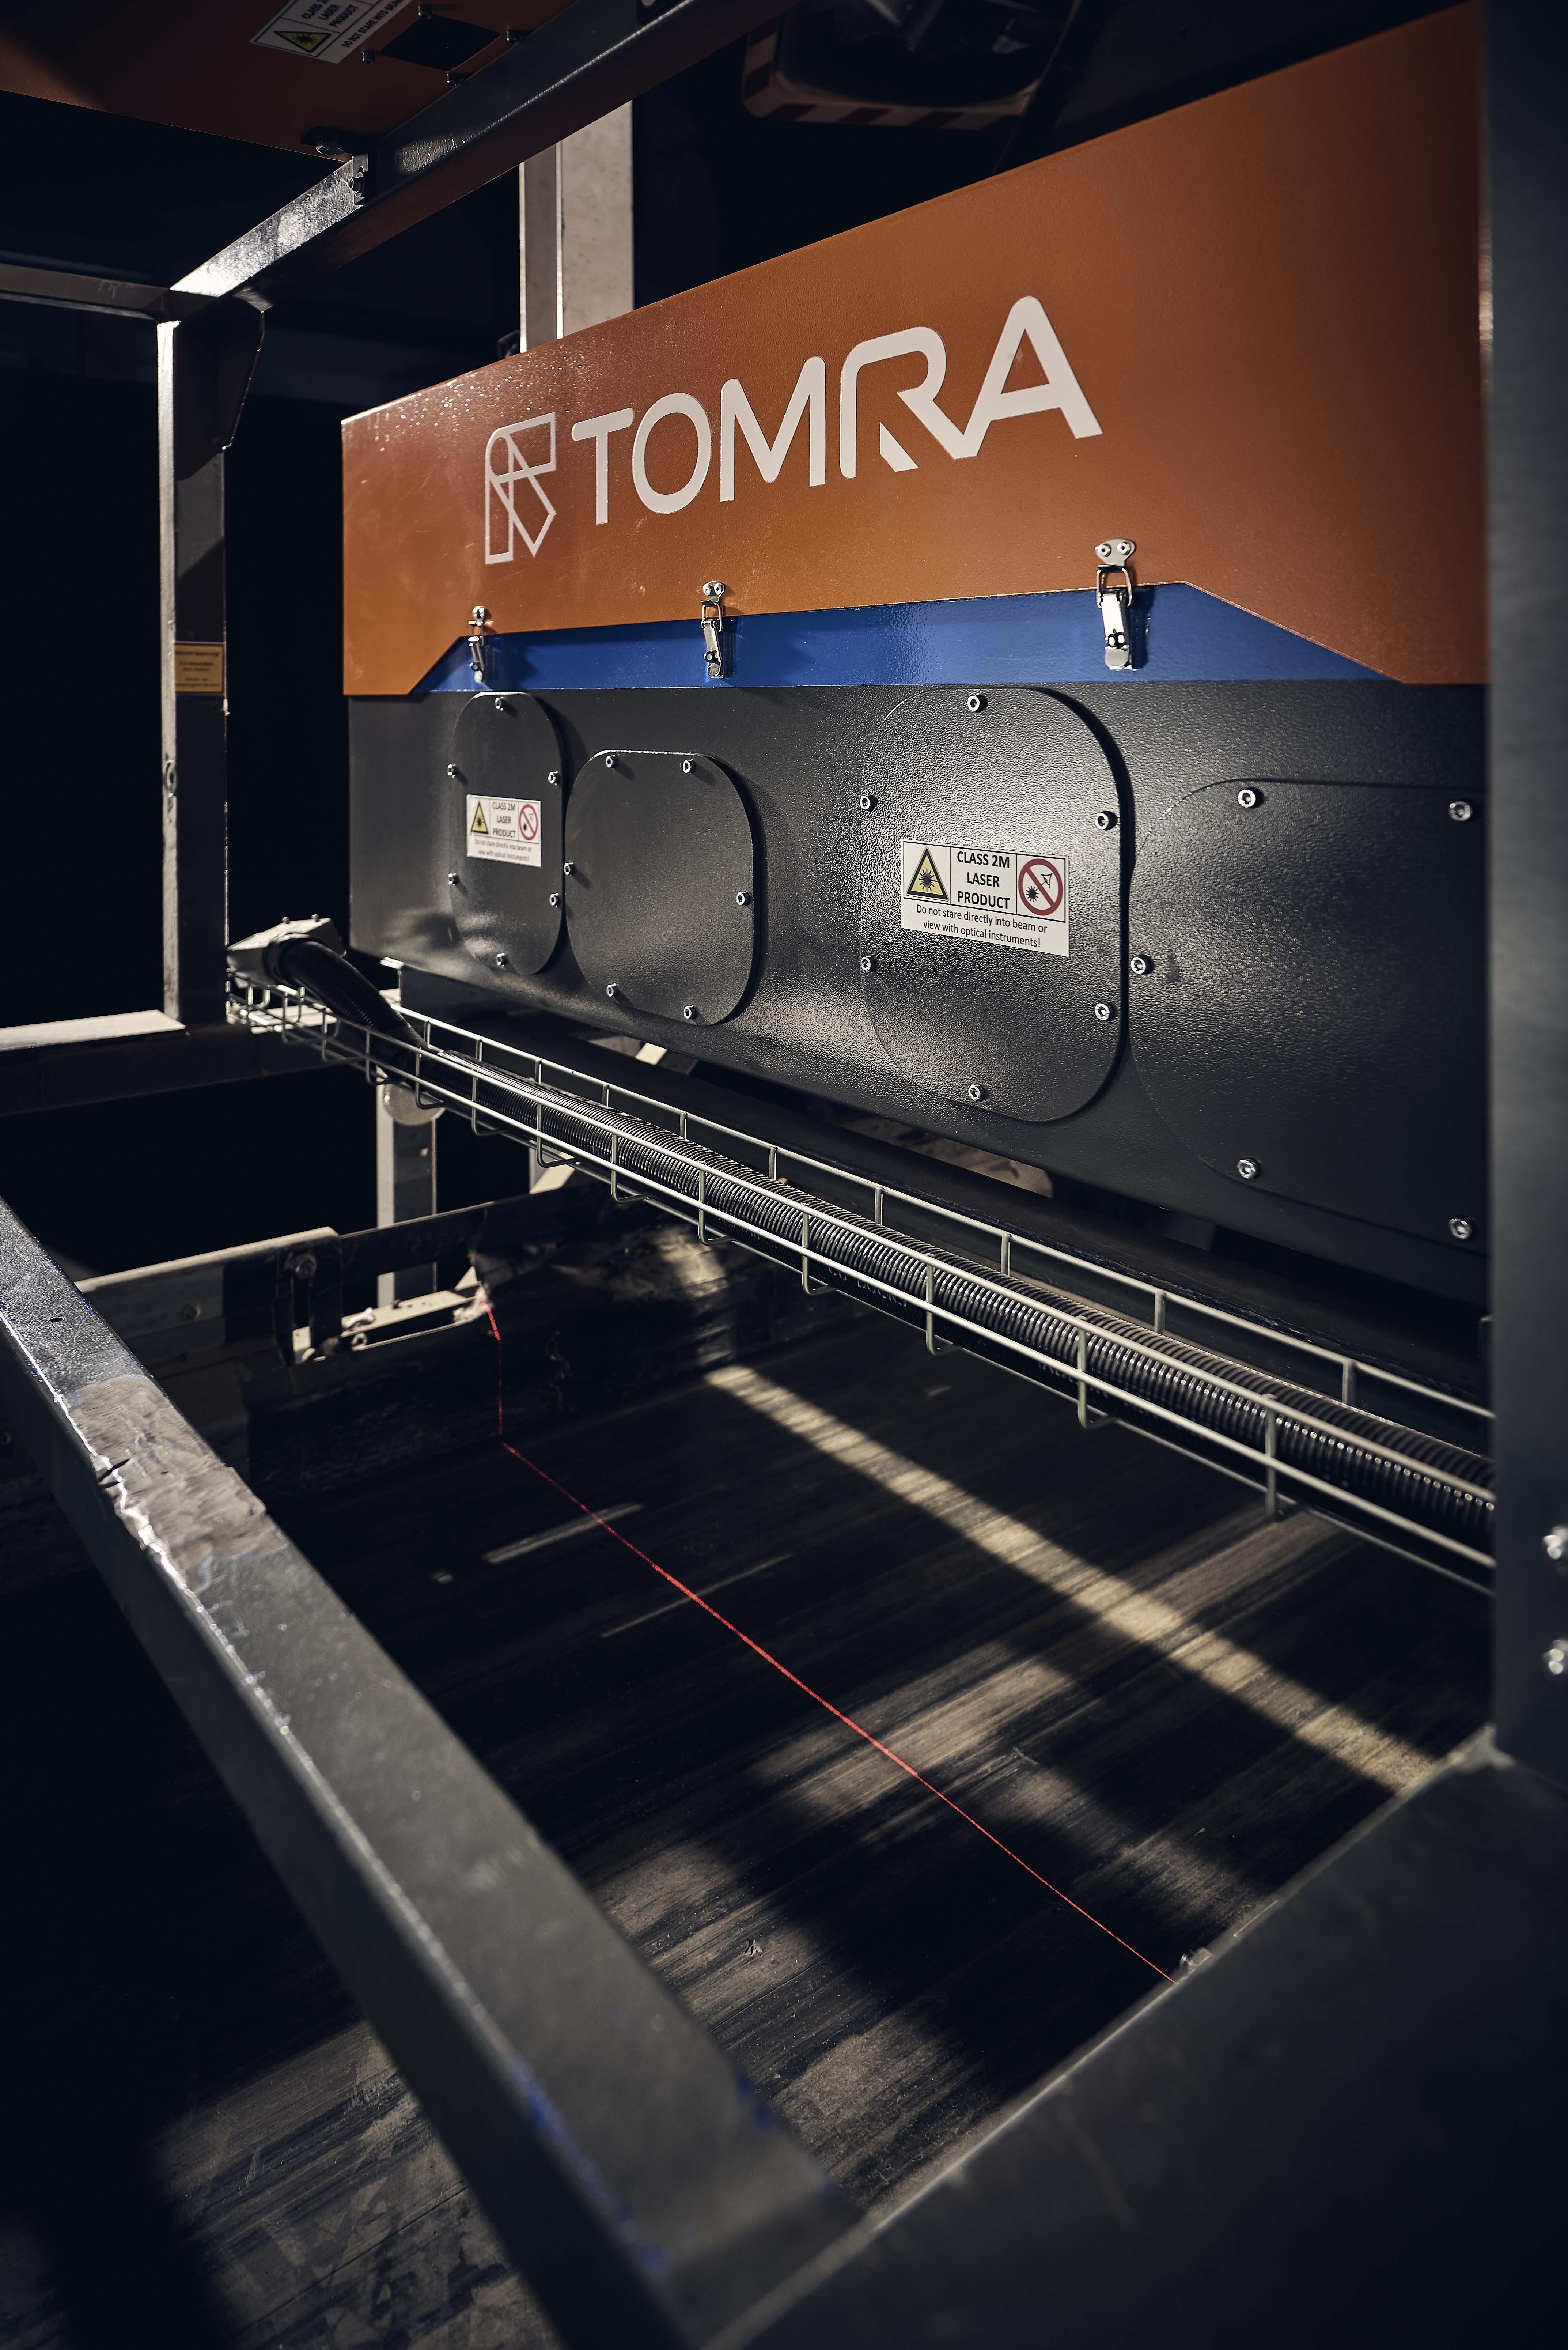 TOMRA_Produktion_12-2020_AUTOSORT_DSC7271